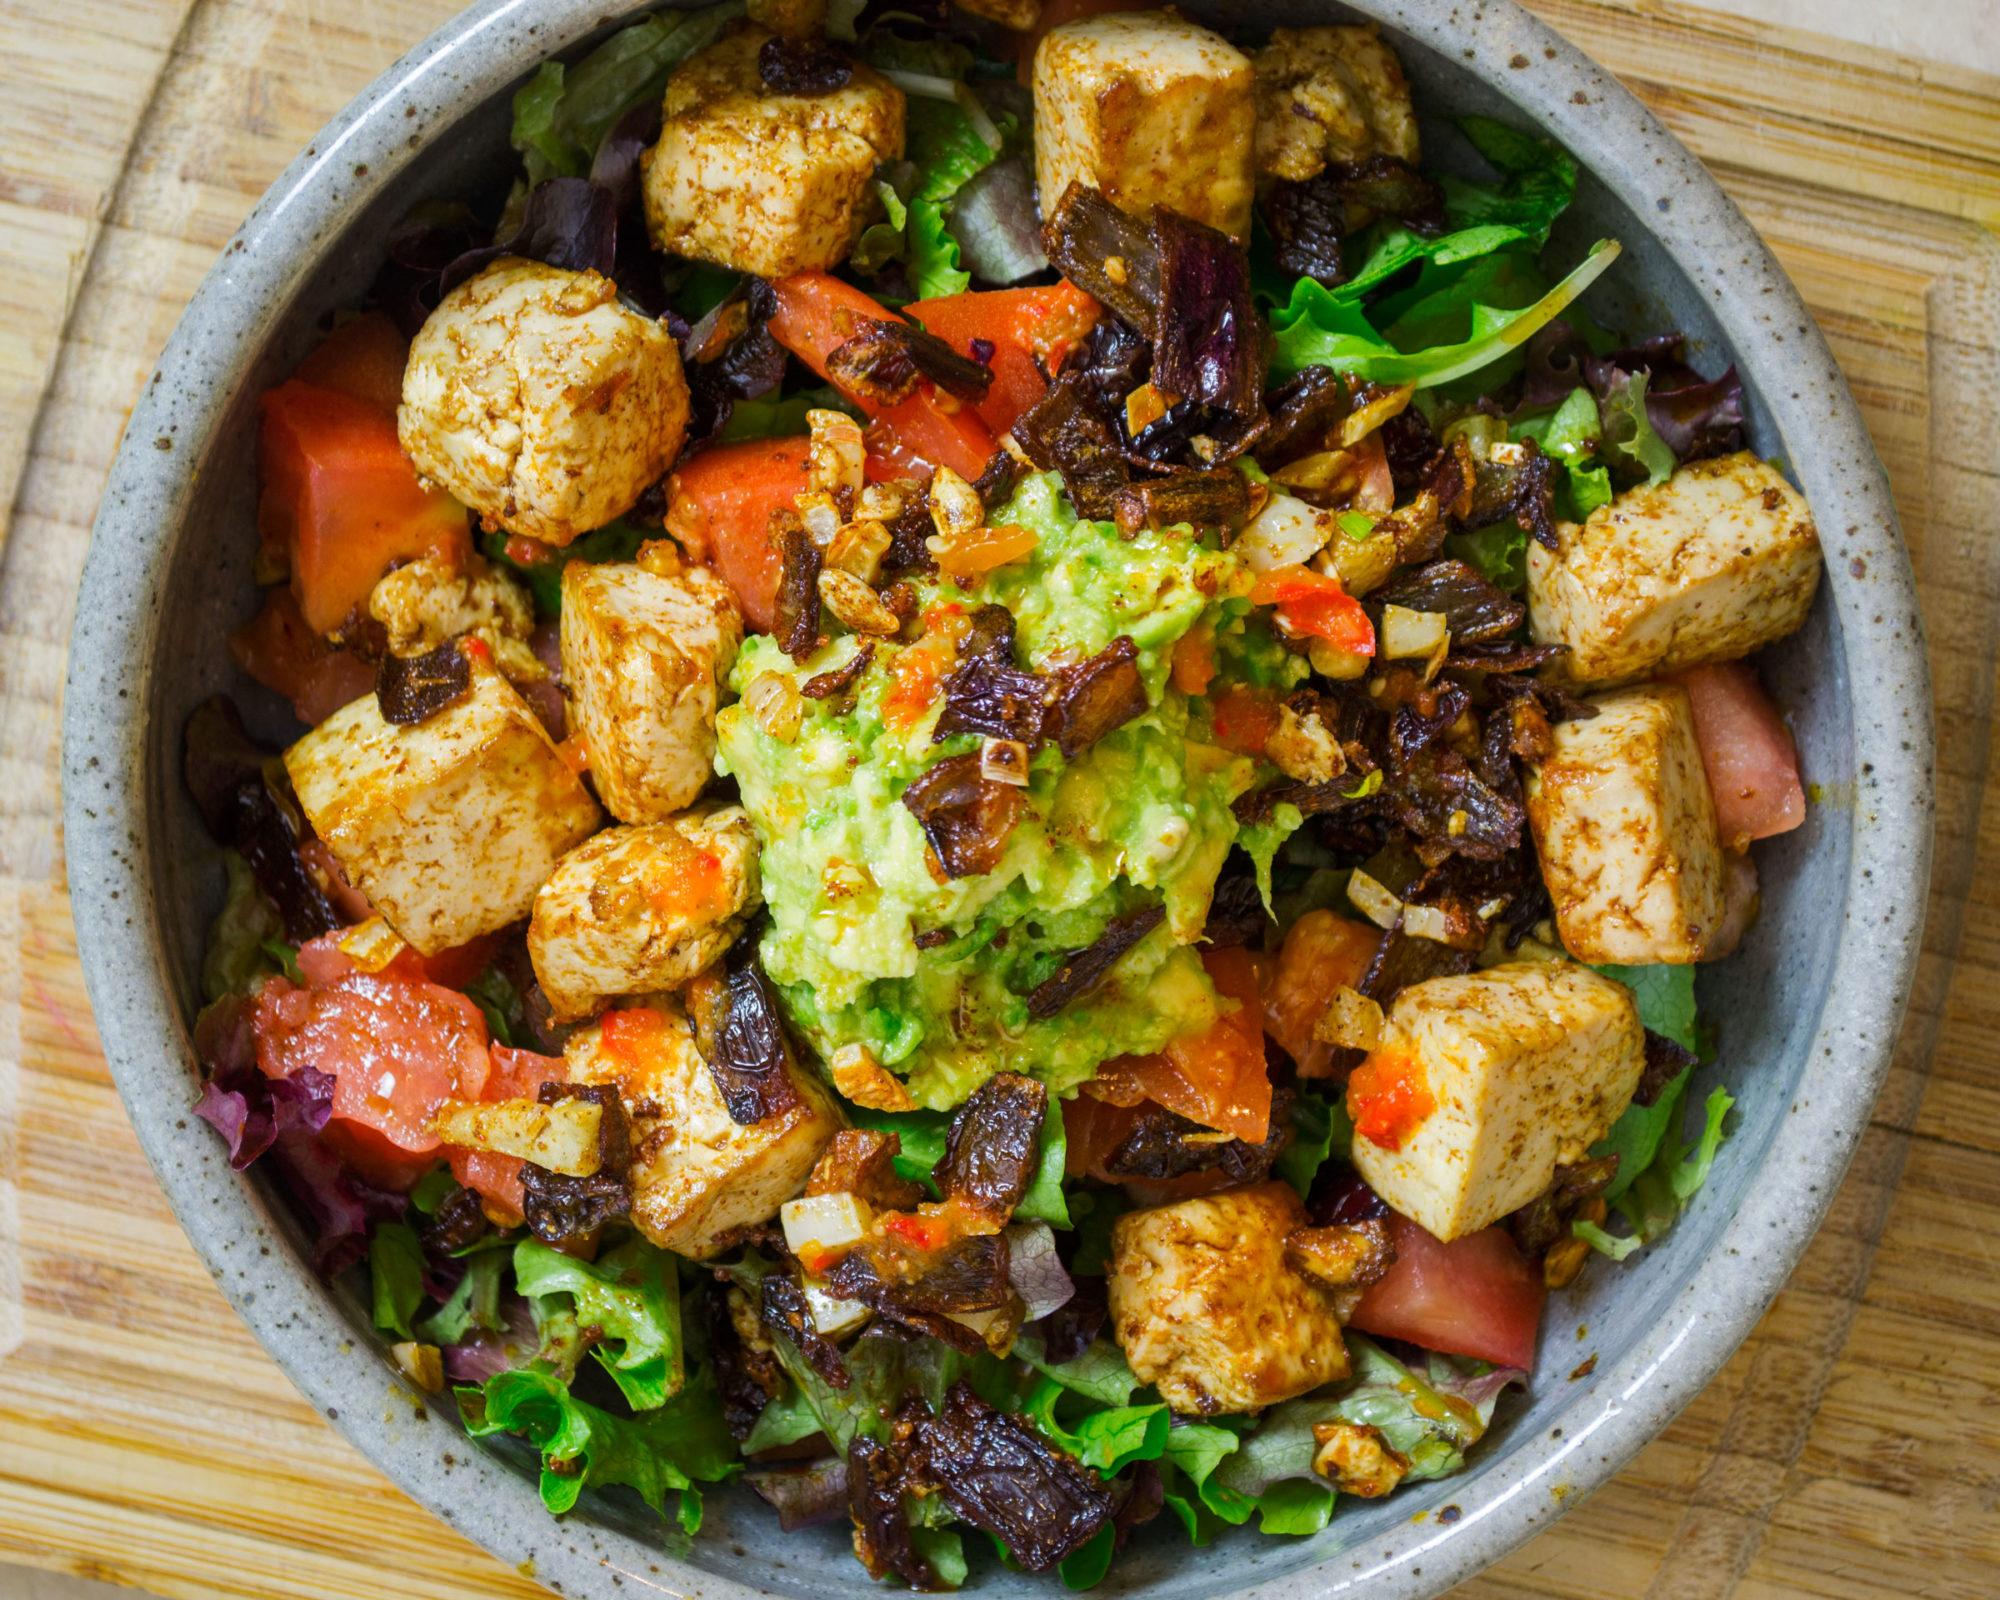 Caramelized Red Onion and Chili-Tofu Salad